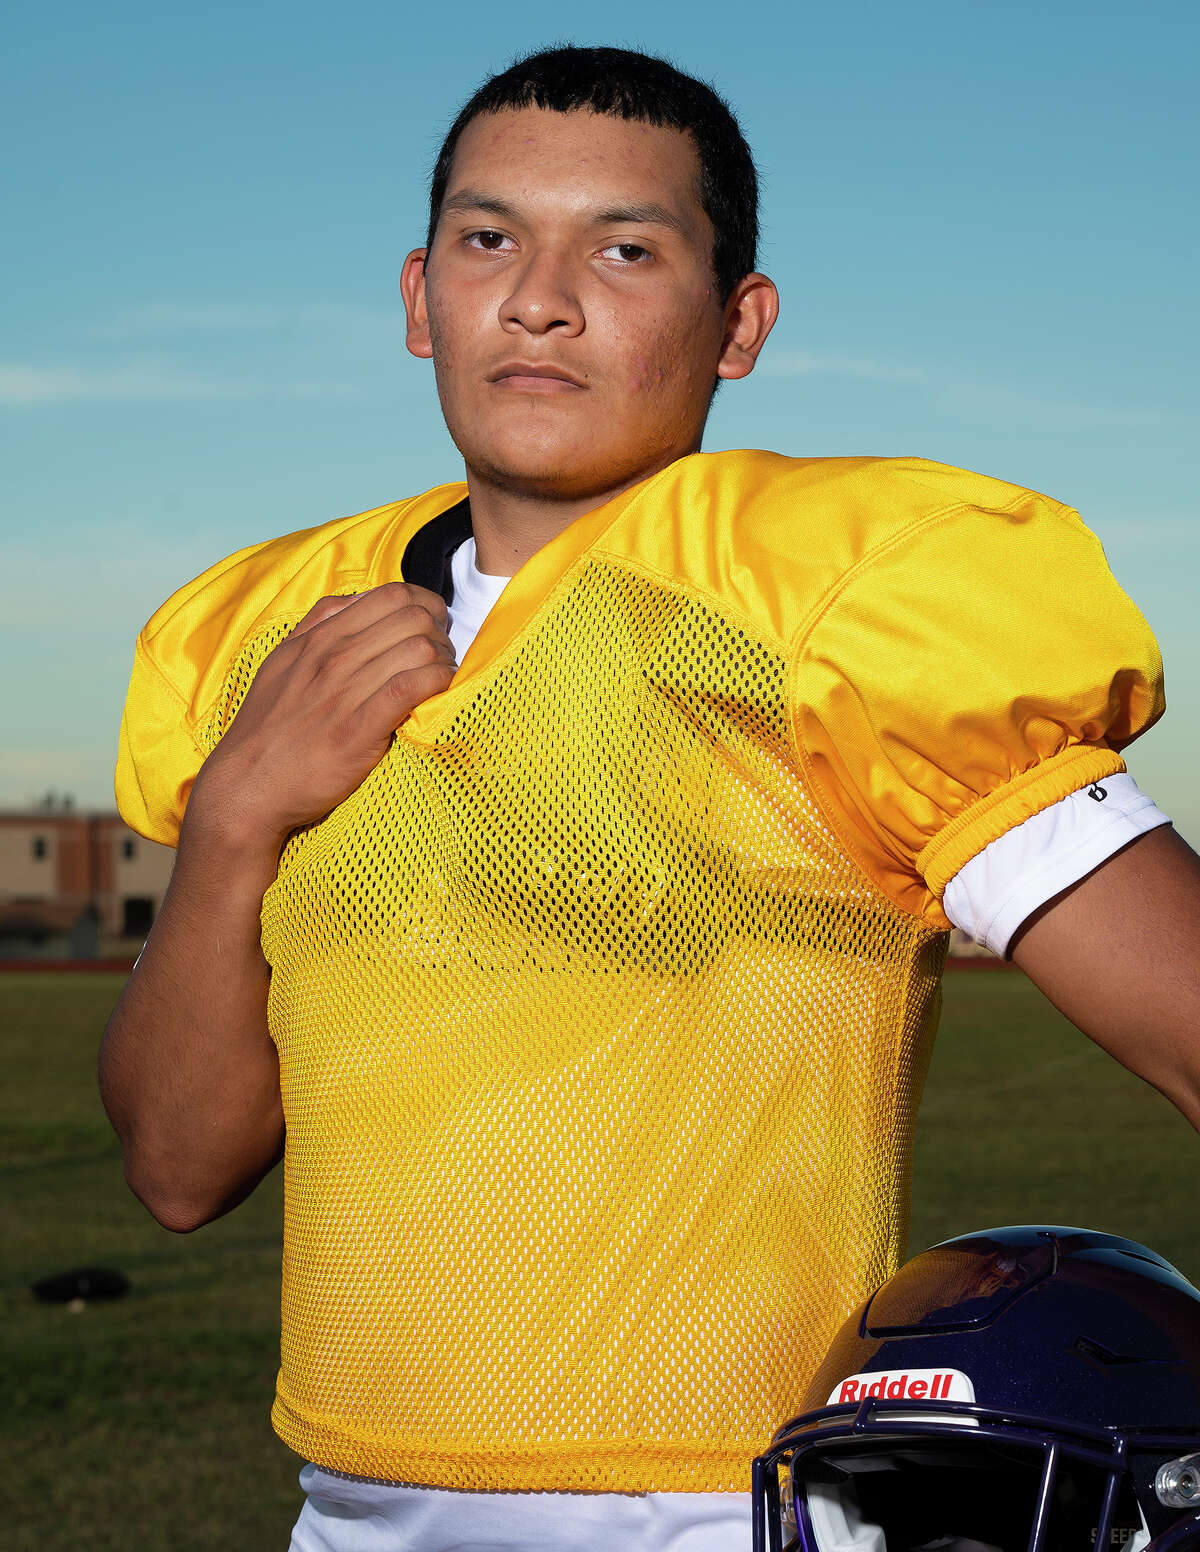 Lyndon B. Johnson High School football newcomer Raul Cantu poses for the LMT Football preview, Monday, Aug. 16, 2021, at LBJ High School.